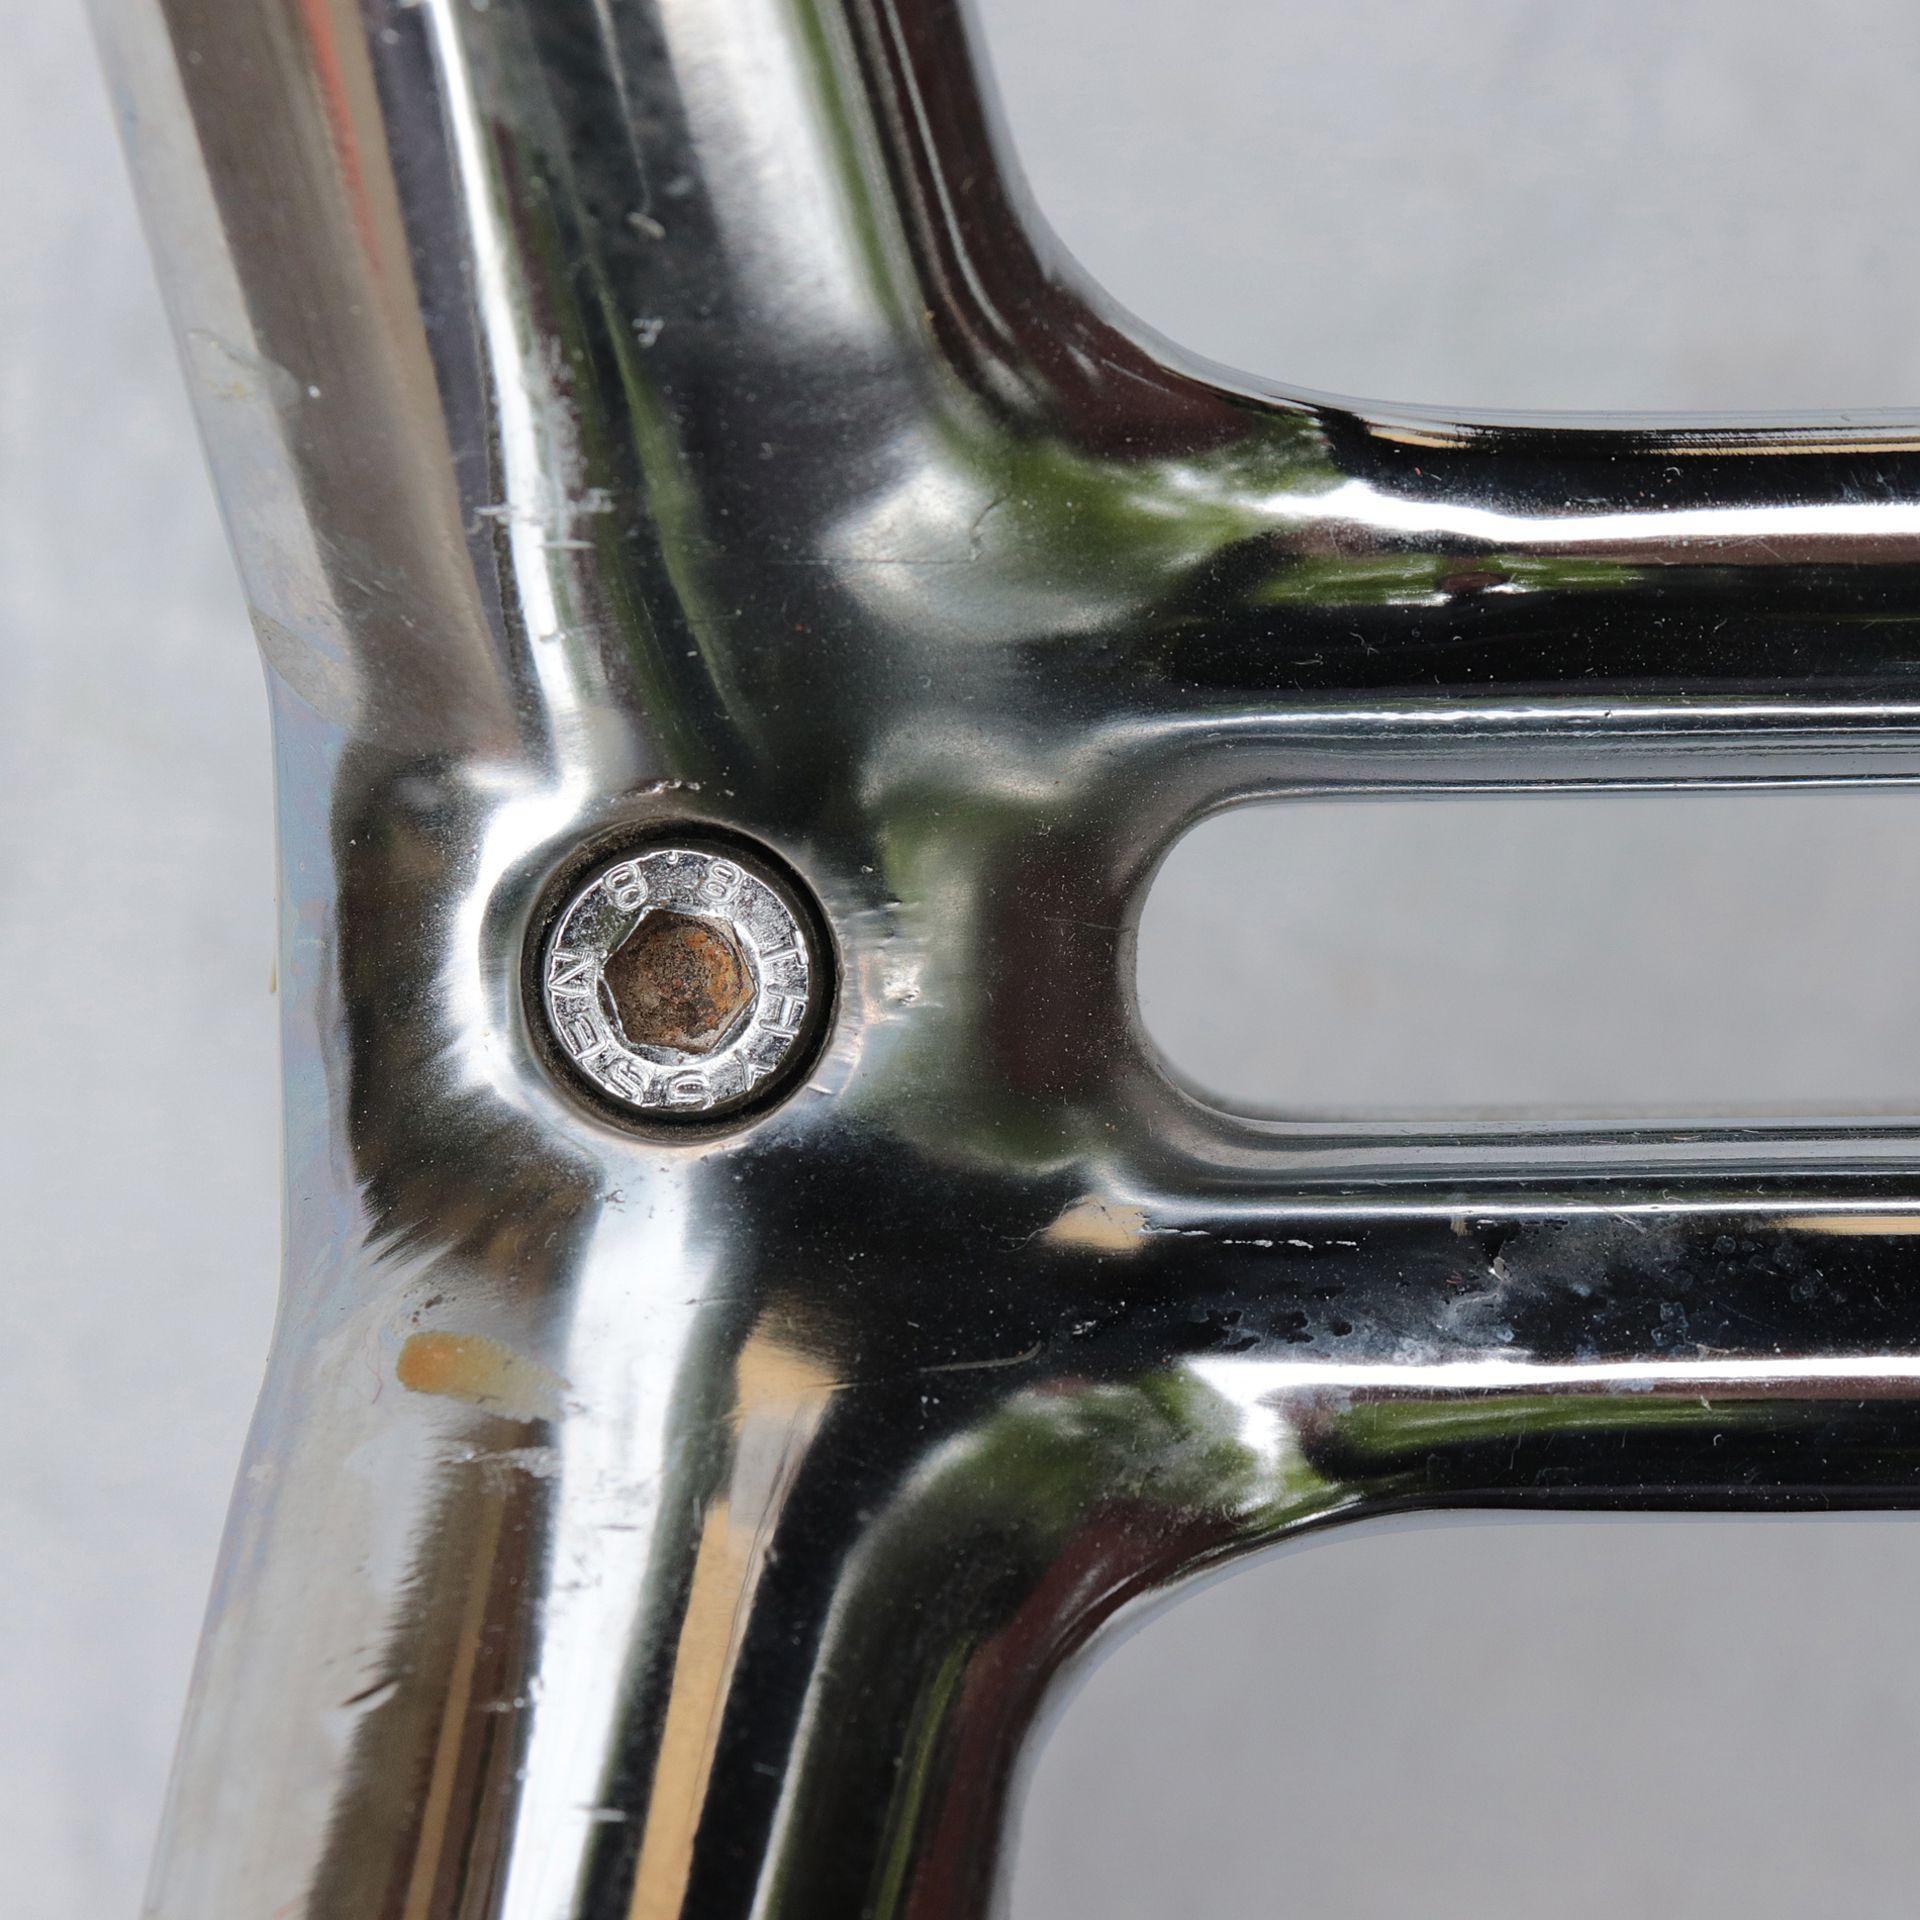 Eames-Schalensessel - 8er Satz - Image 6 of 9